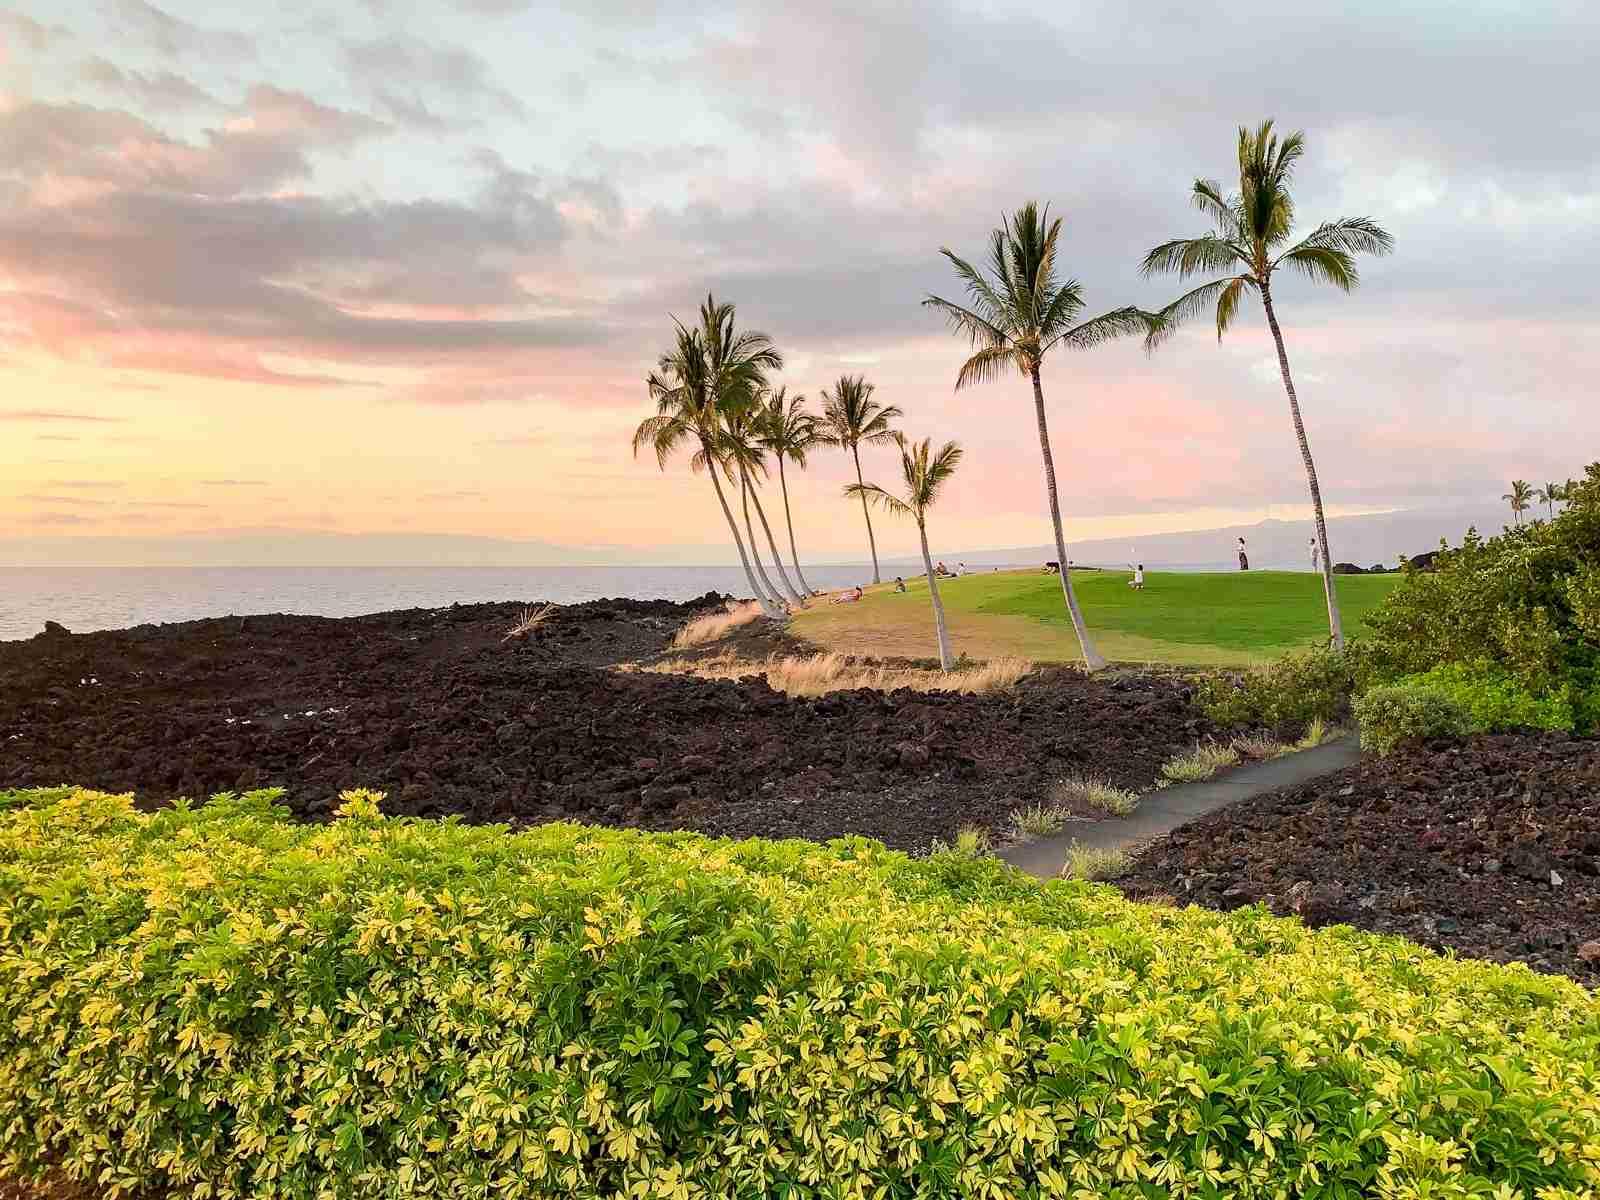 Hilton Waikoloa Village (Photo by Summer Hull / The Points Guy)